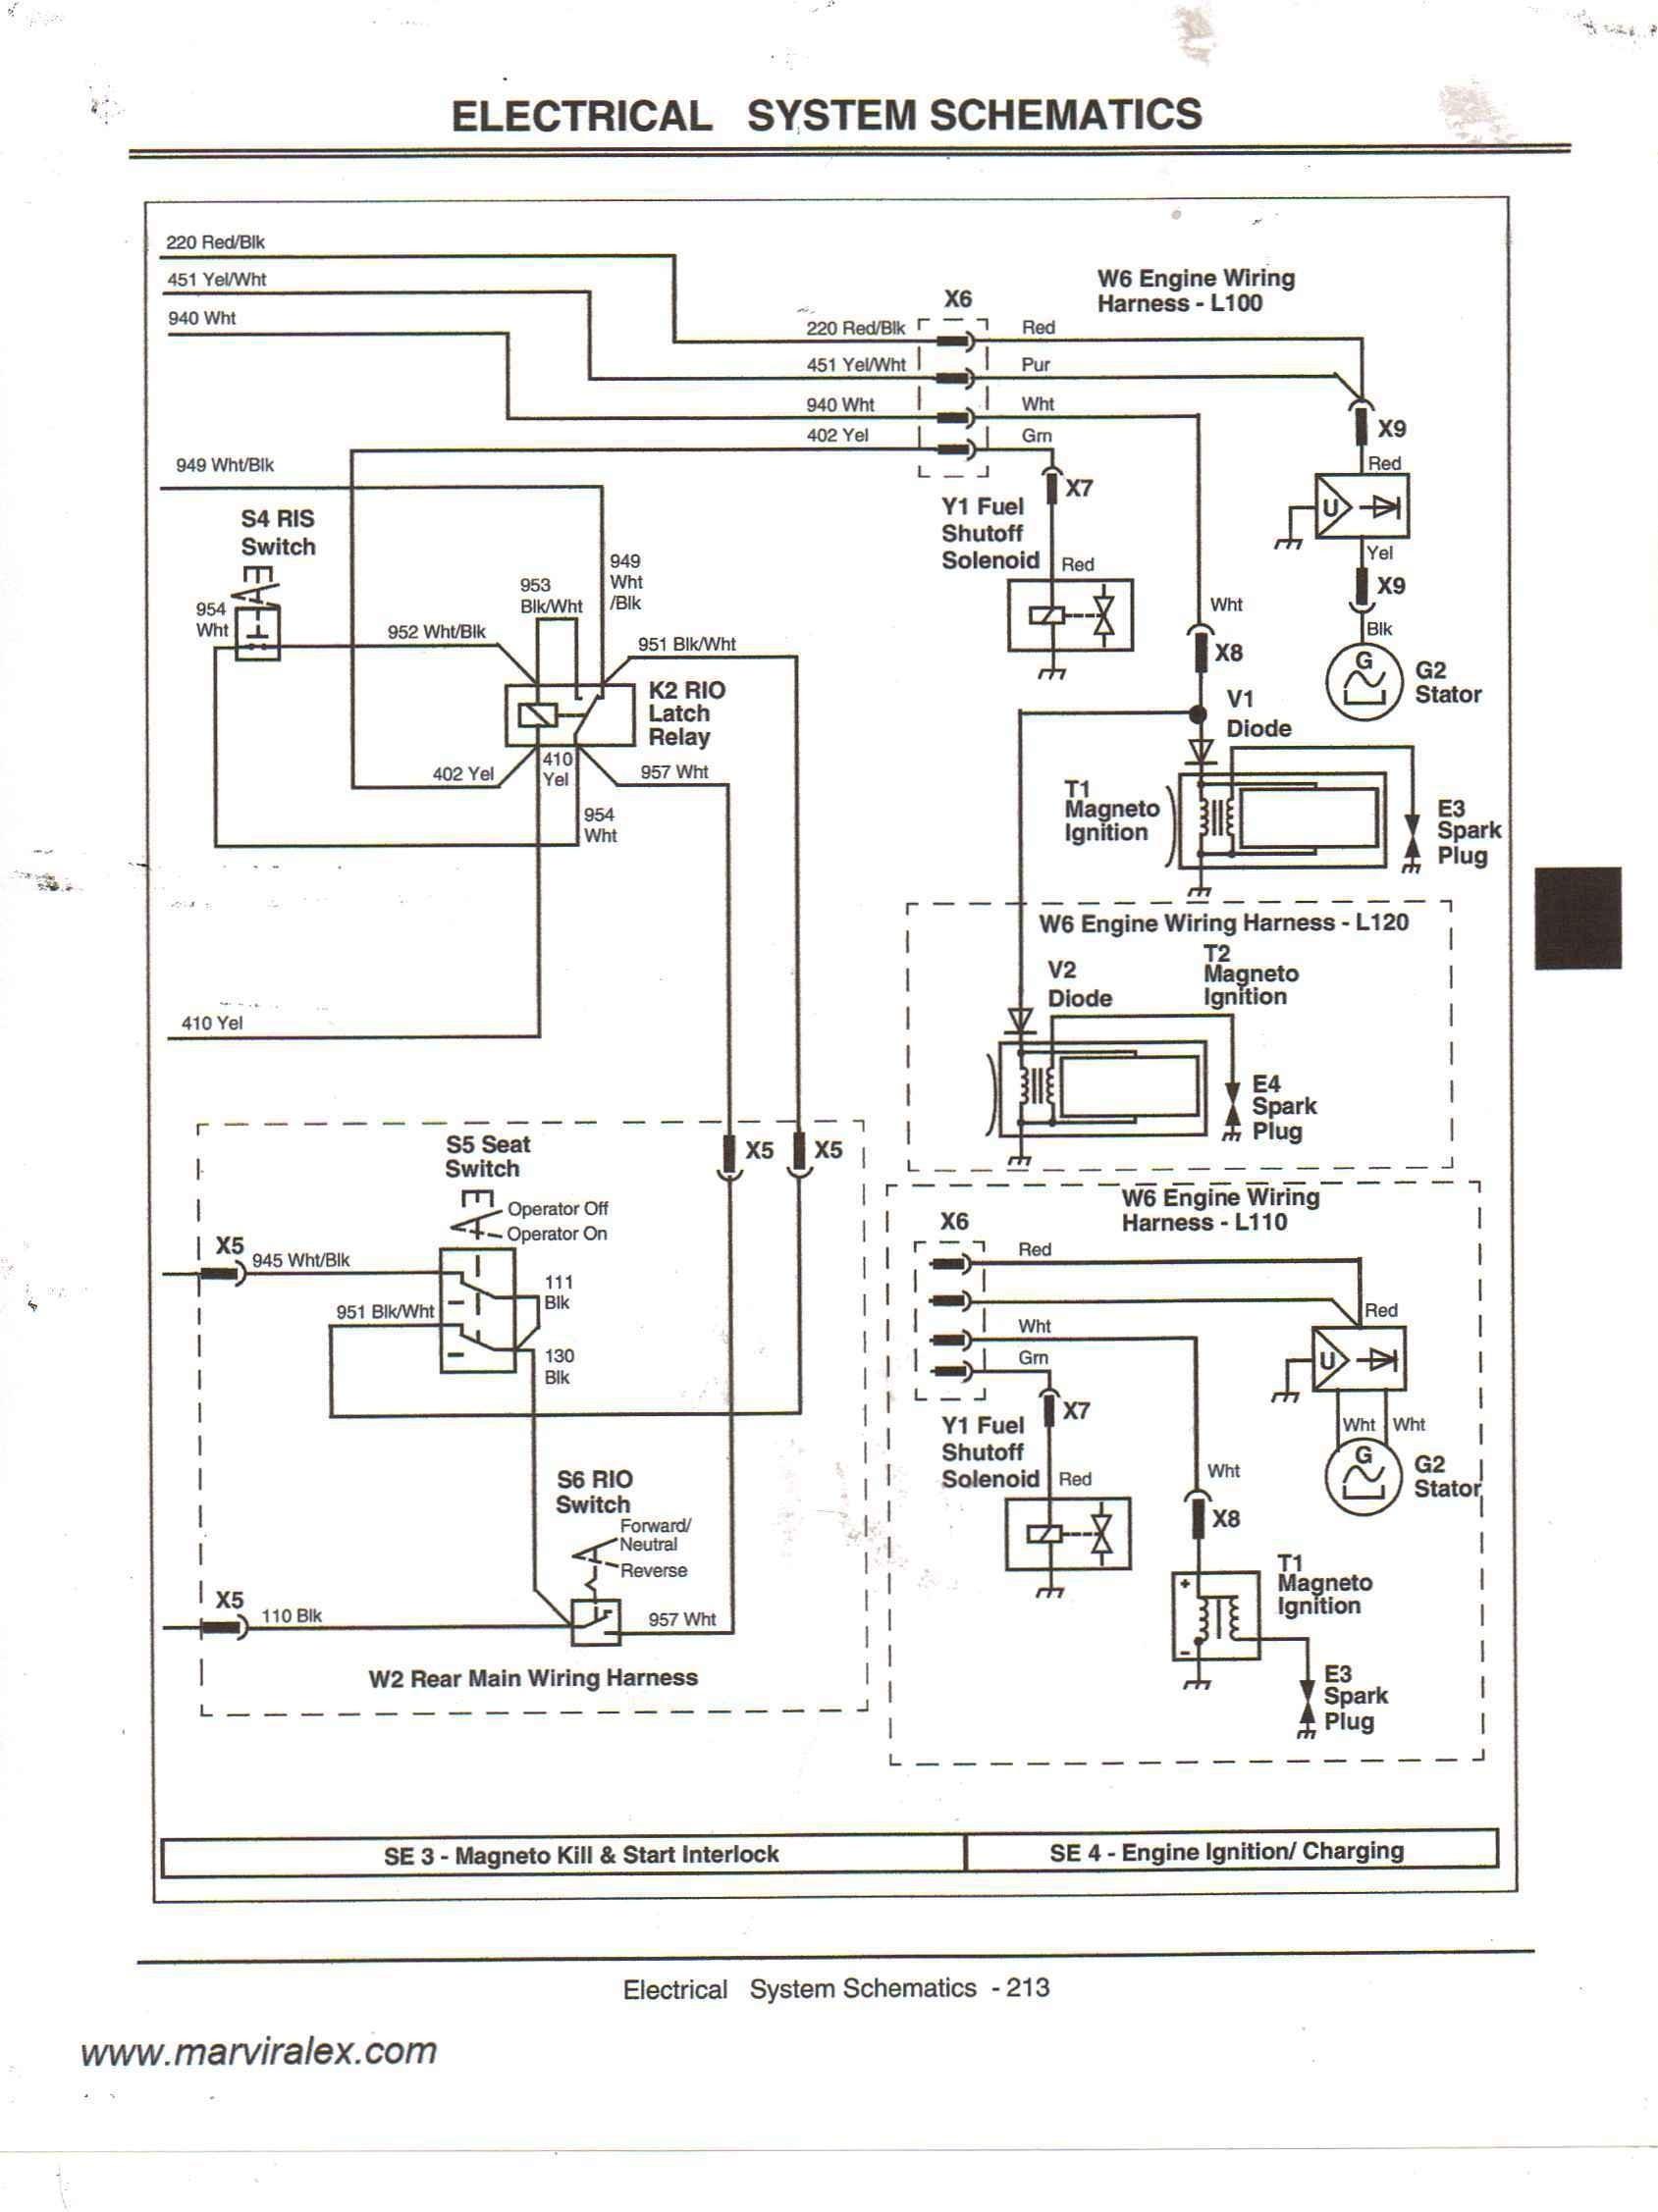 Wire Schematic for John Deere Gator Ts 4×2 John Deere Hpx Wiring Diagram Wiring Diagram Data Of Wire Schematic for John Deere Gator Ts 4×2